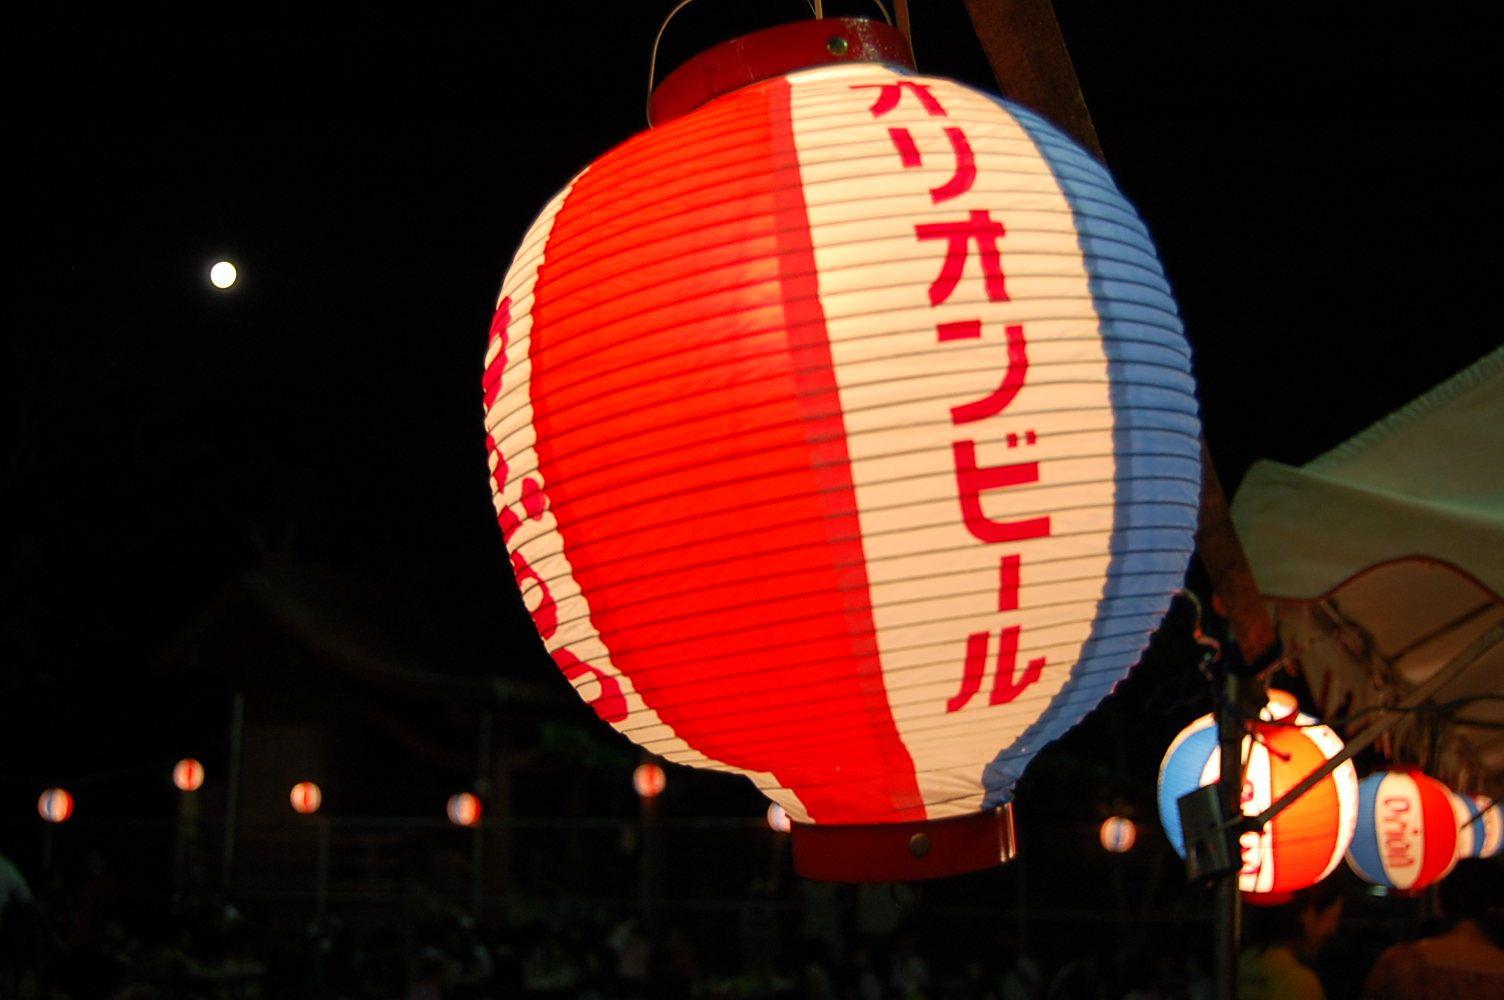 It S Not An Okinawan Party With Orion Beer Lanterns Okinawa Ryukyu Islands Okinawa Japan